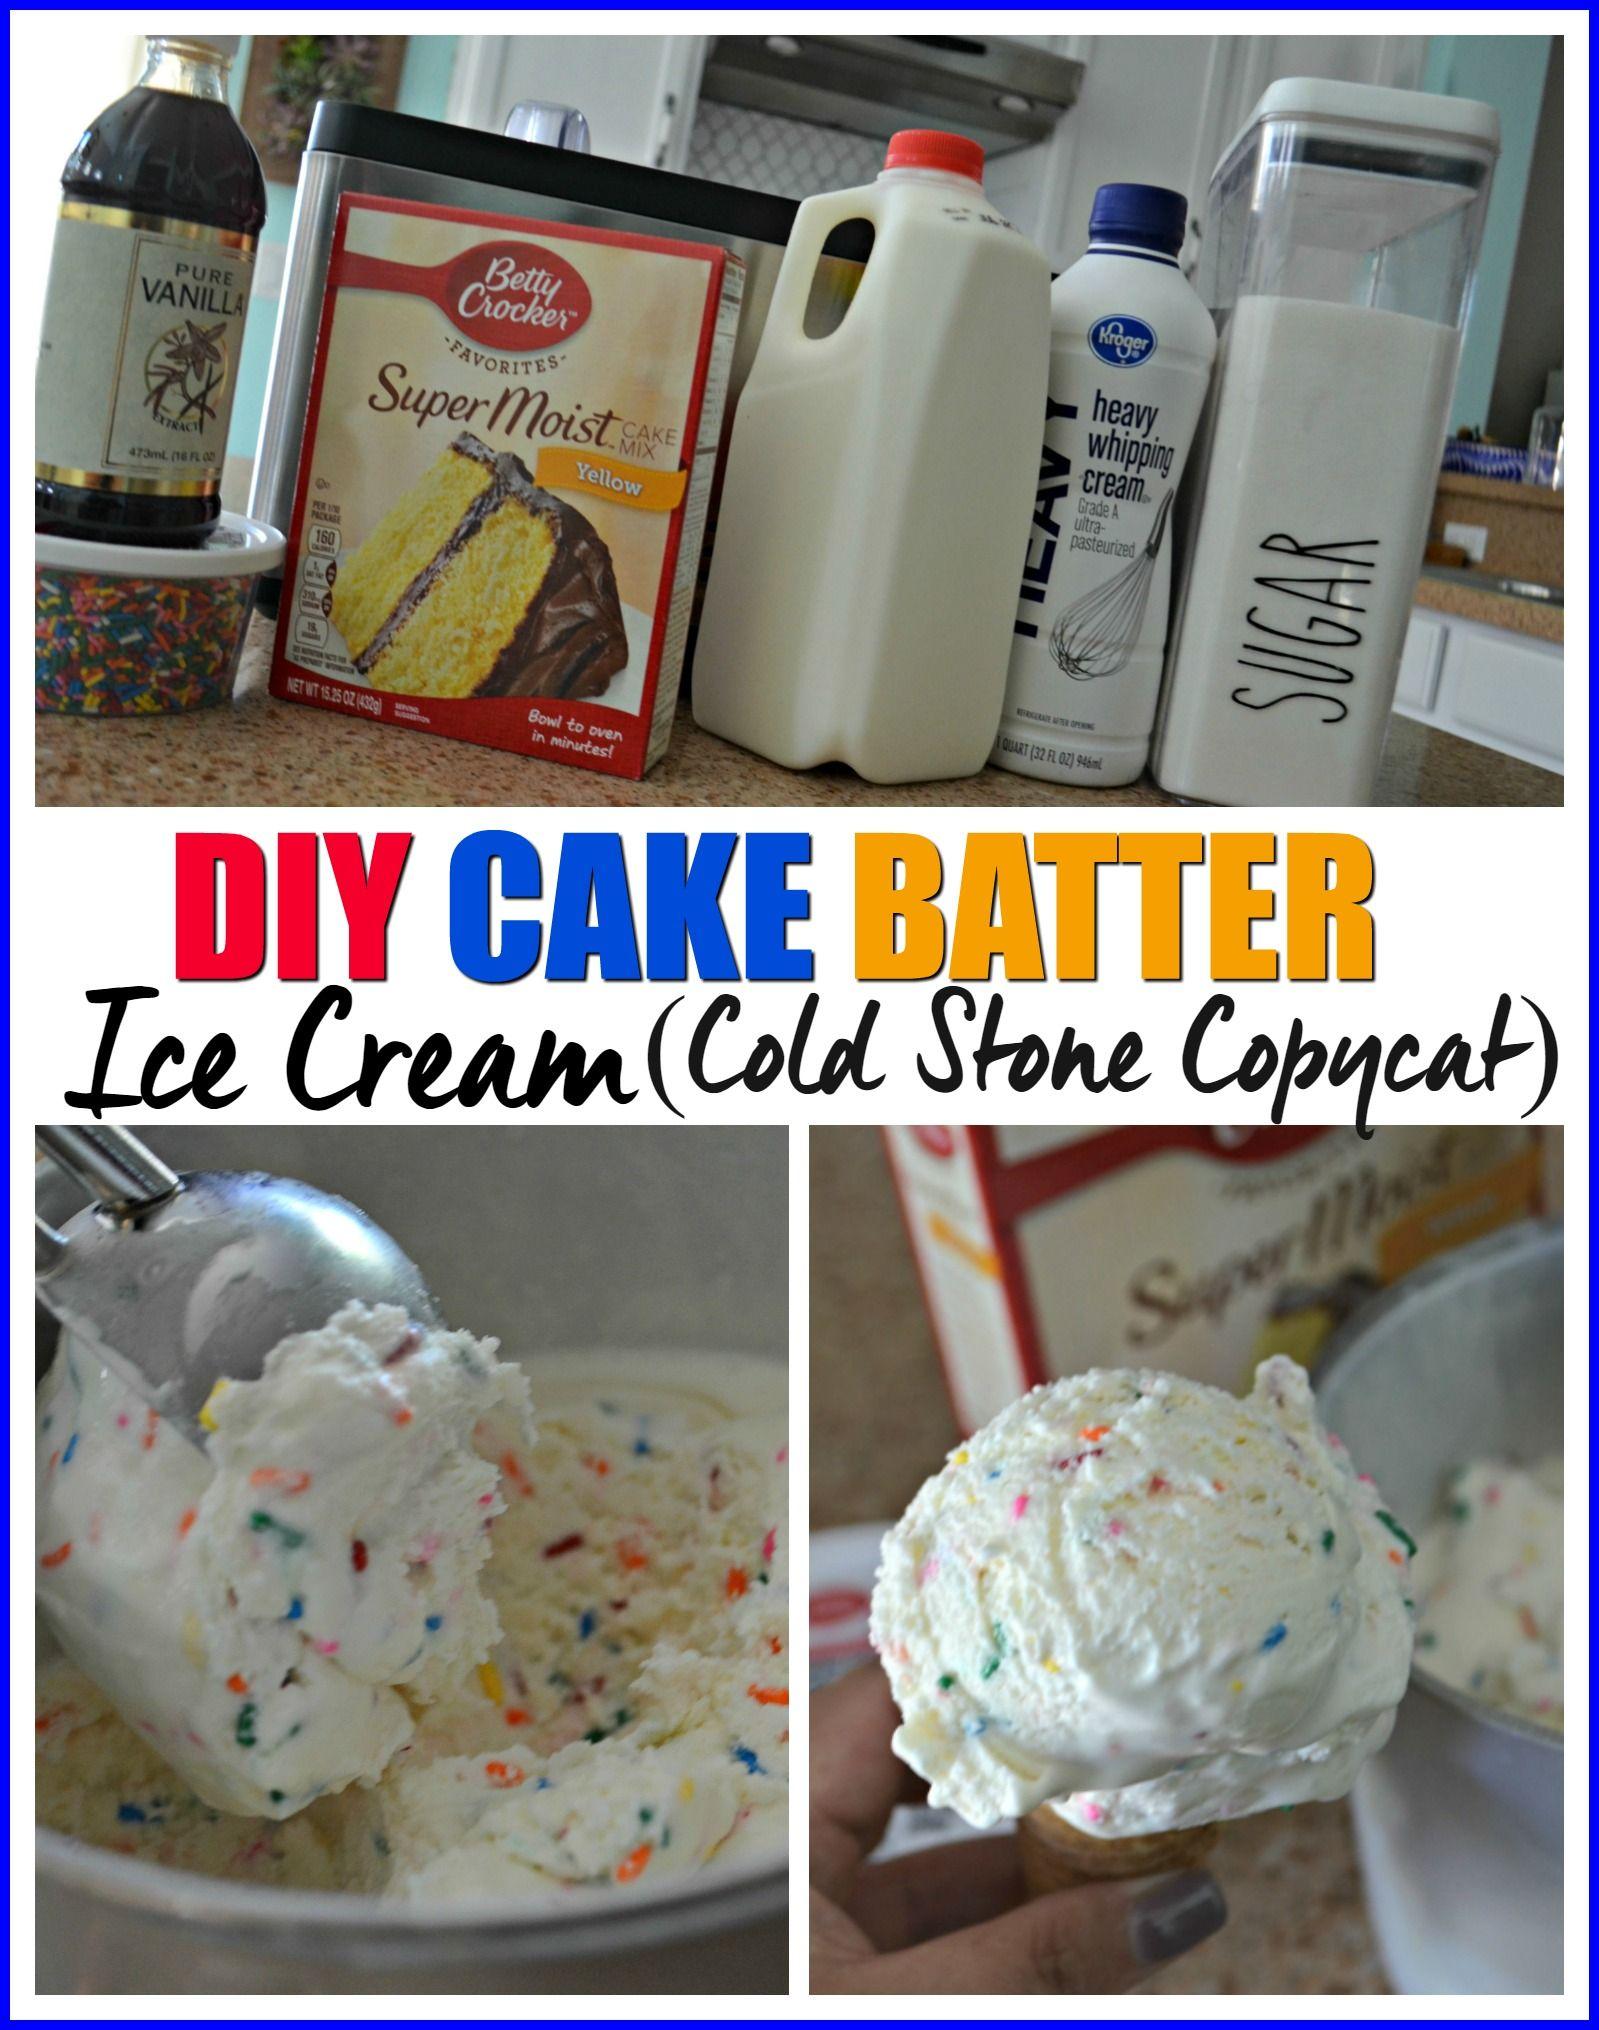 Homemade Cake Batter Ice Cream